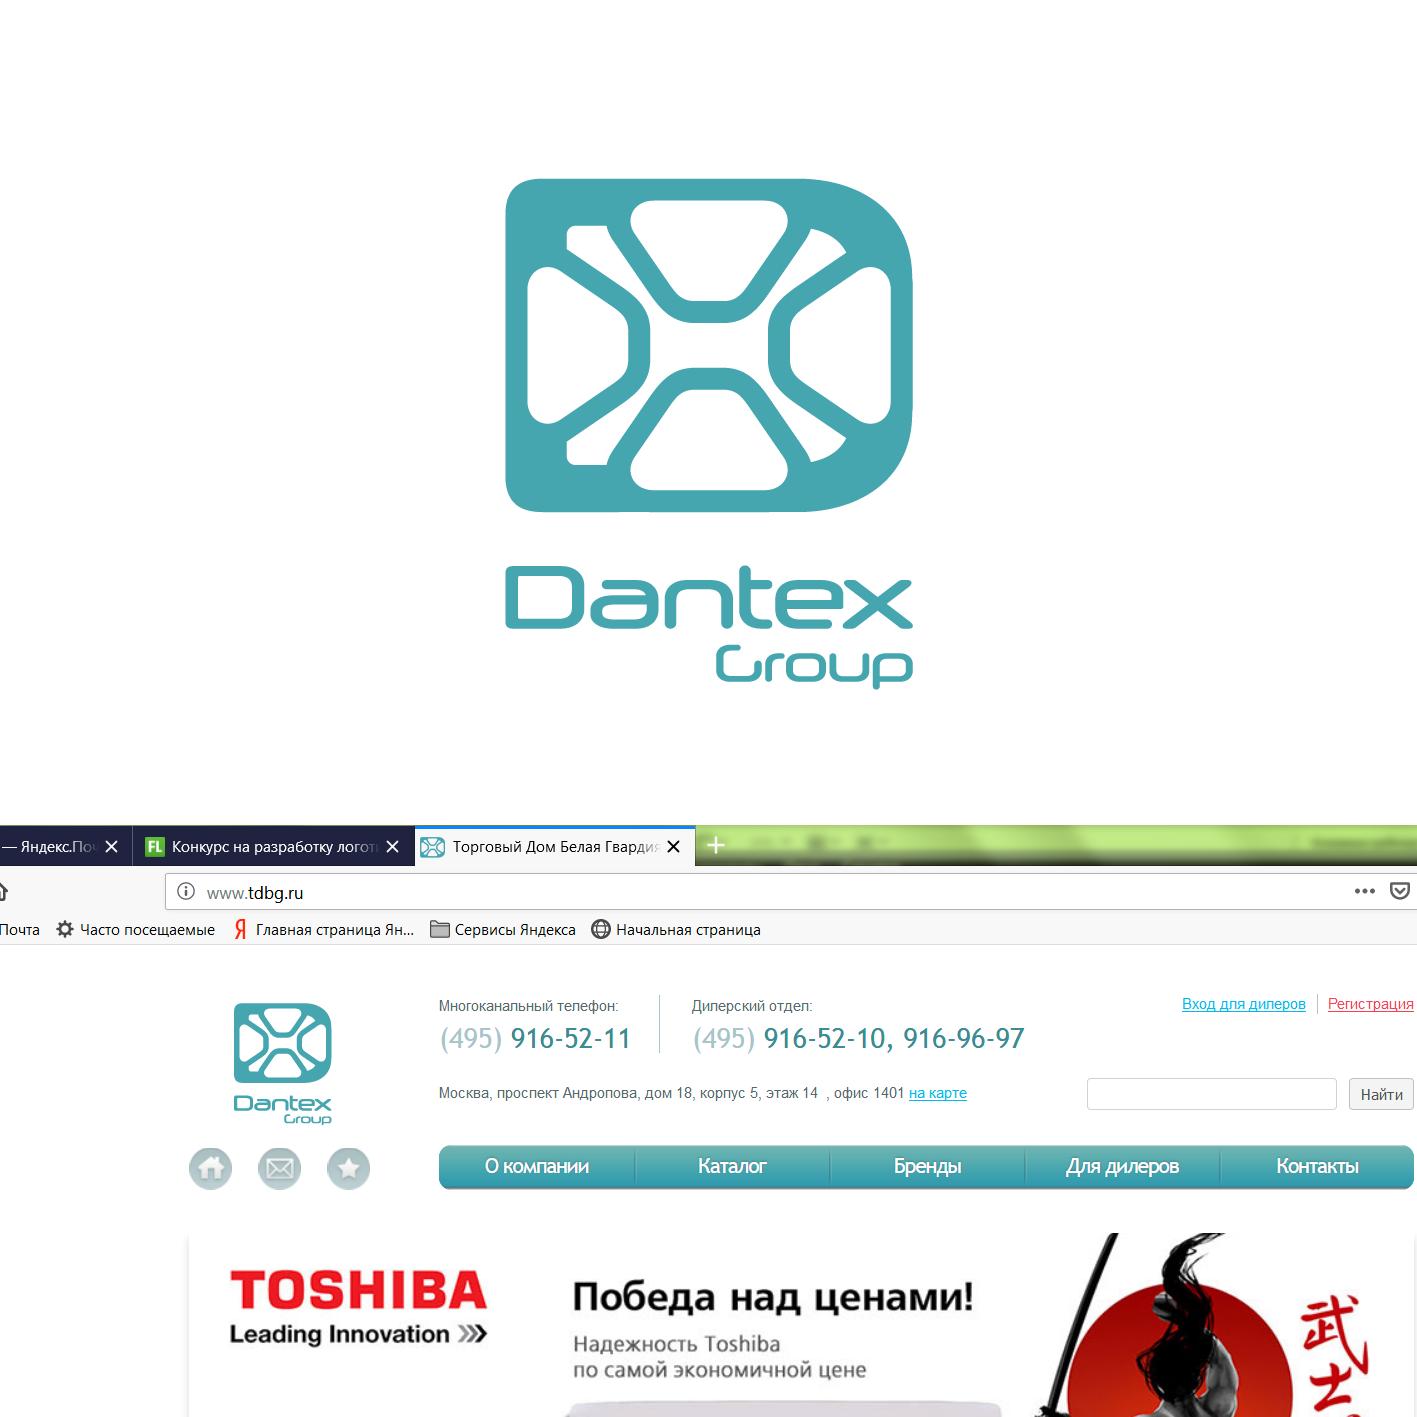 Конкурс на разработку логотипа для компании Dantex Group  фото f_9365c102c010a404.png